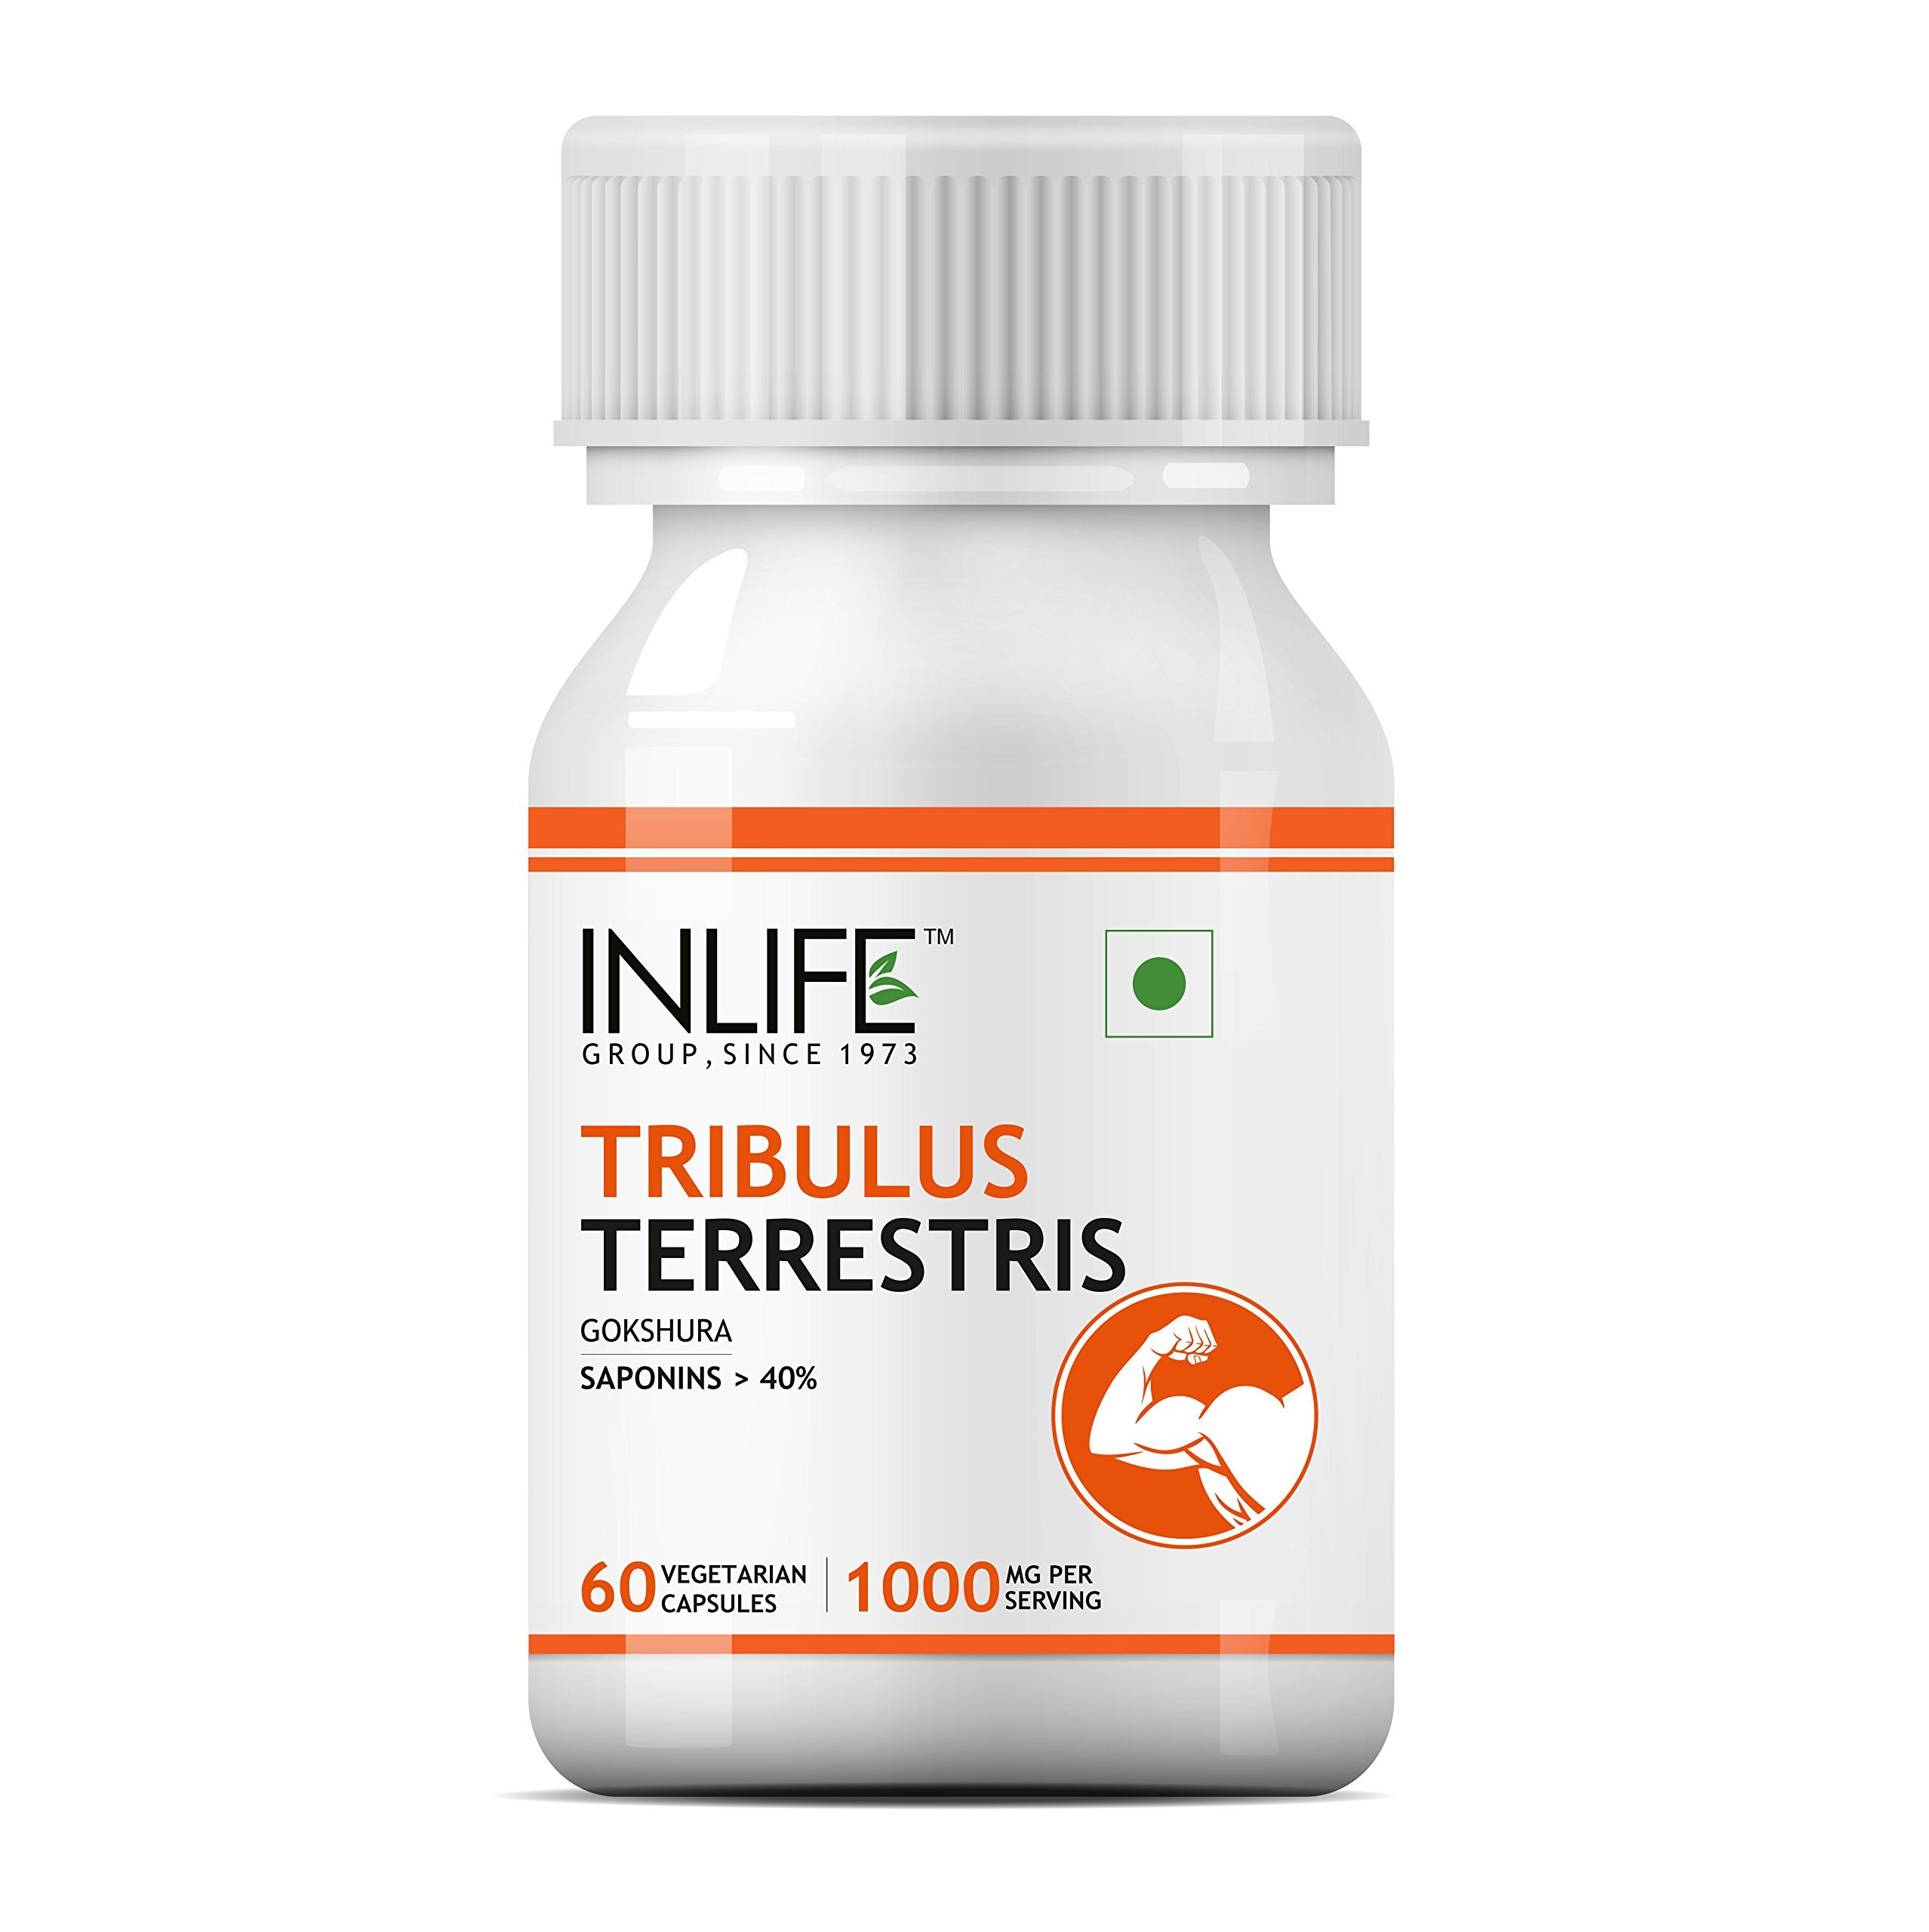 Inlife Tribulus Supplement, Saponins > 40%, 1000 Mg per Serving - 60 Vegetarian Capsules